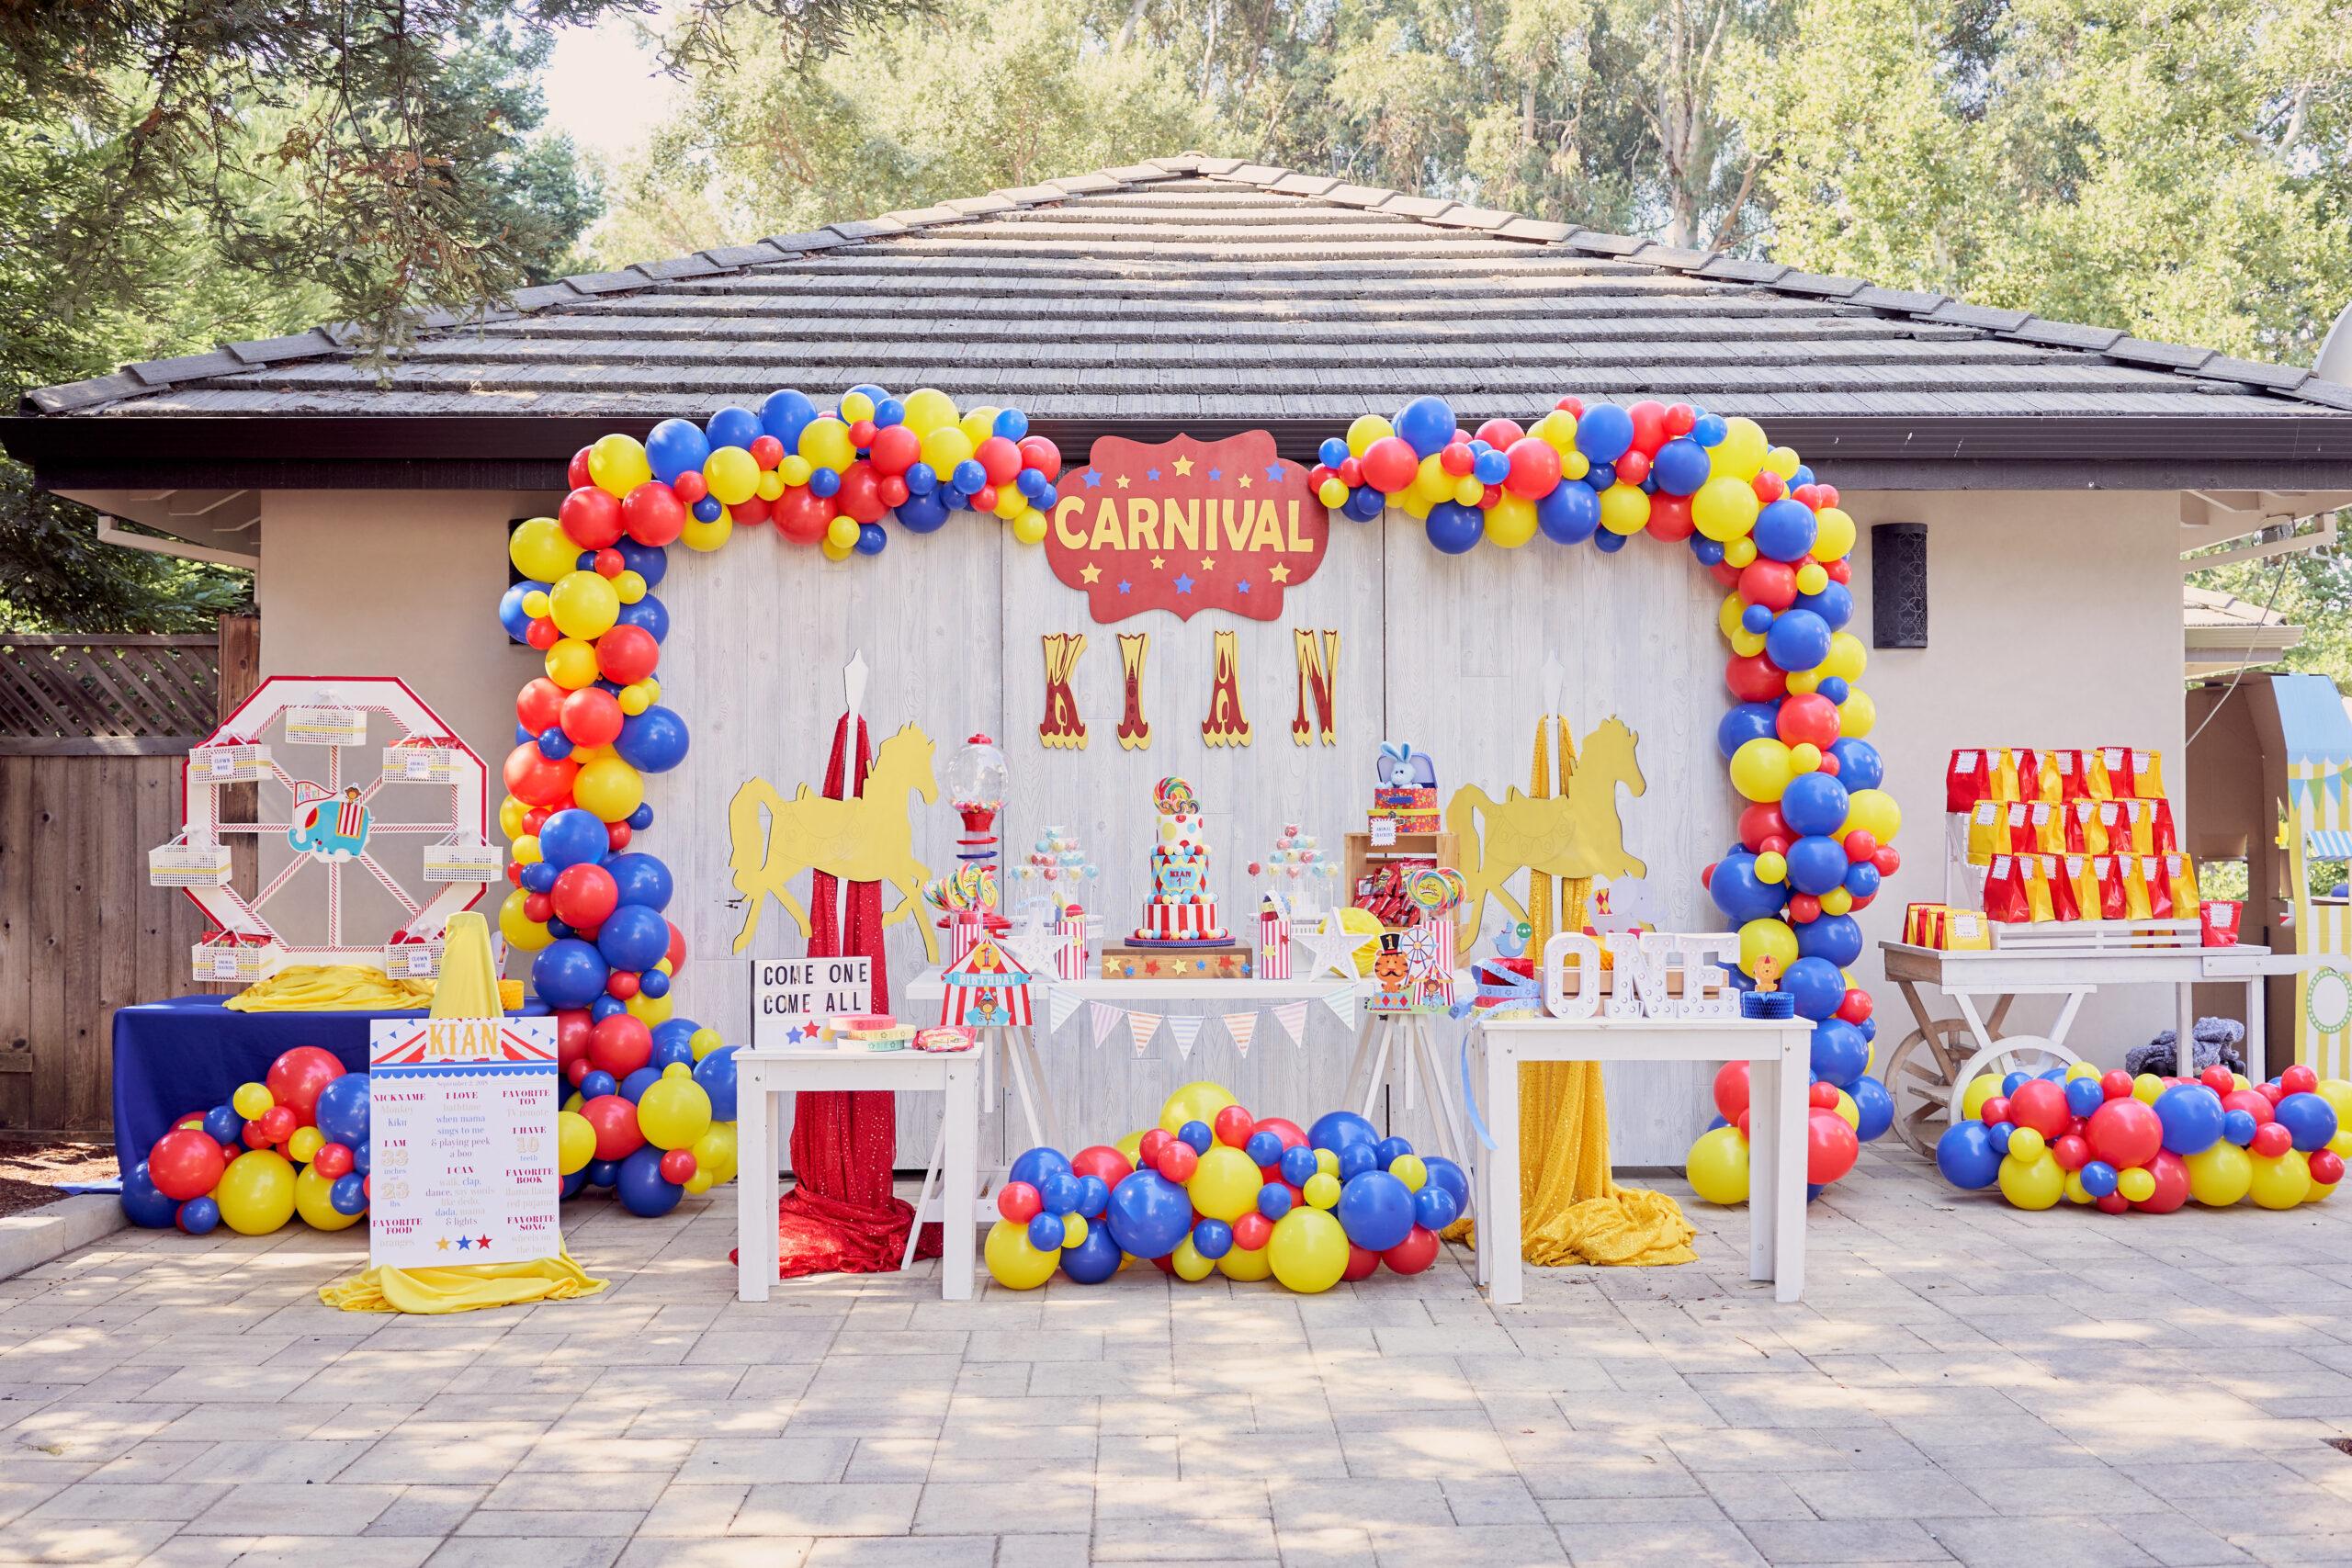 Sarsie's Parties 09-02-18 Carnival Birthday Party